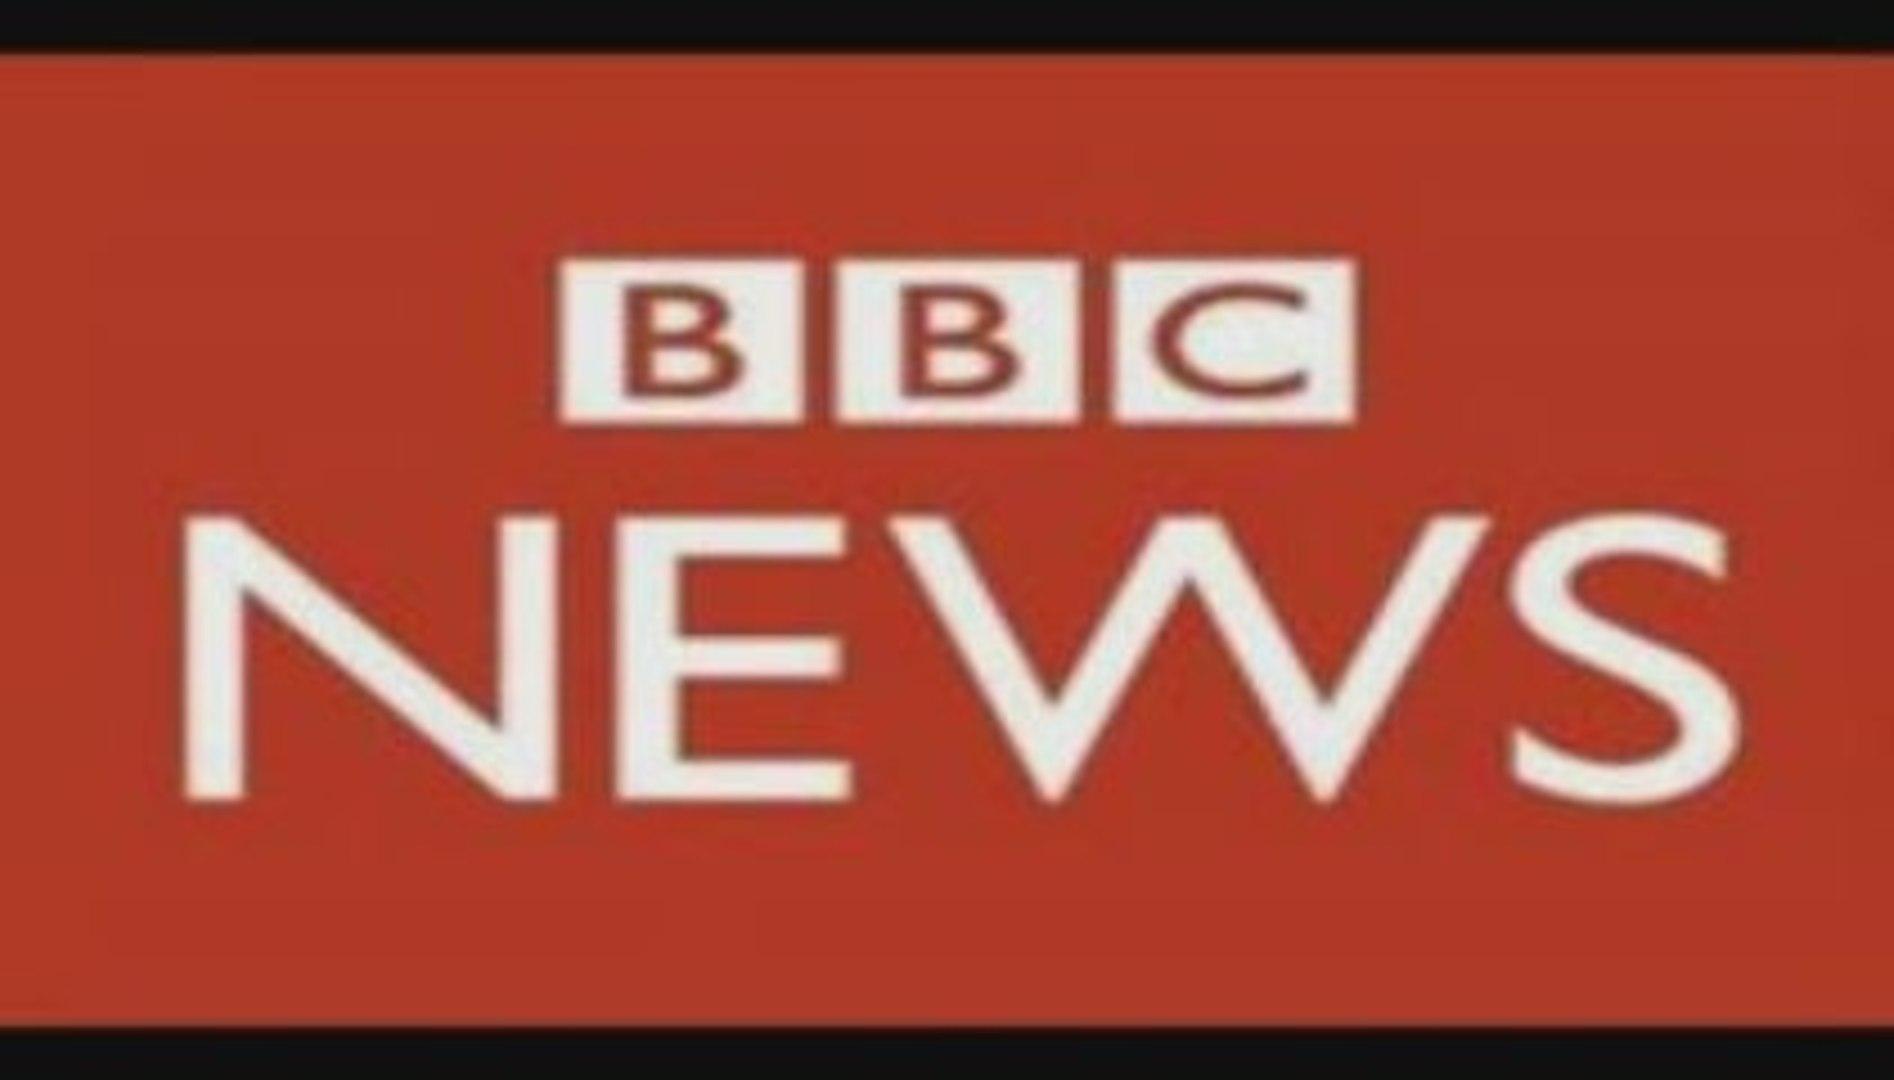 BBC news full theme